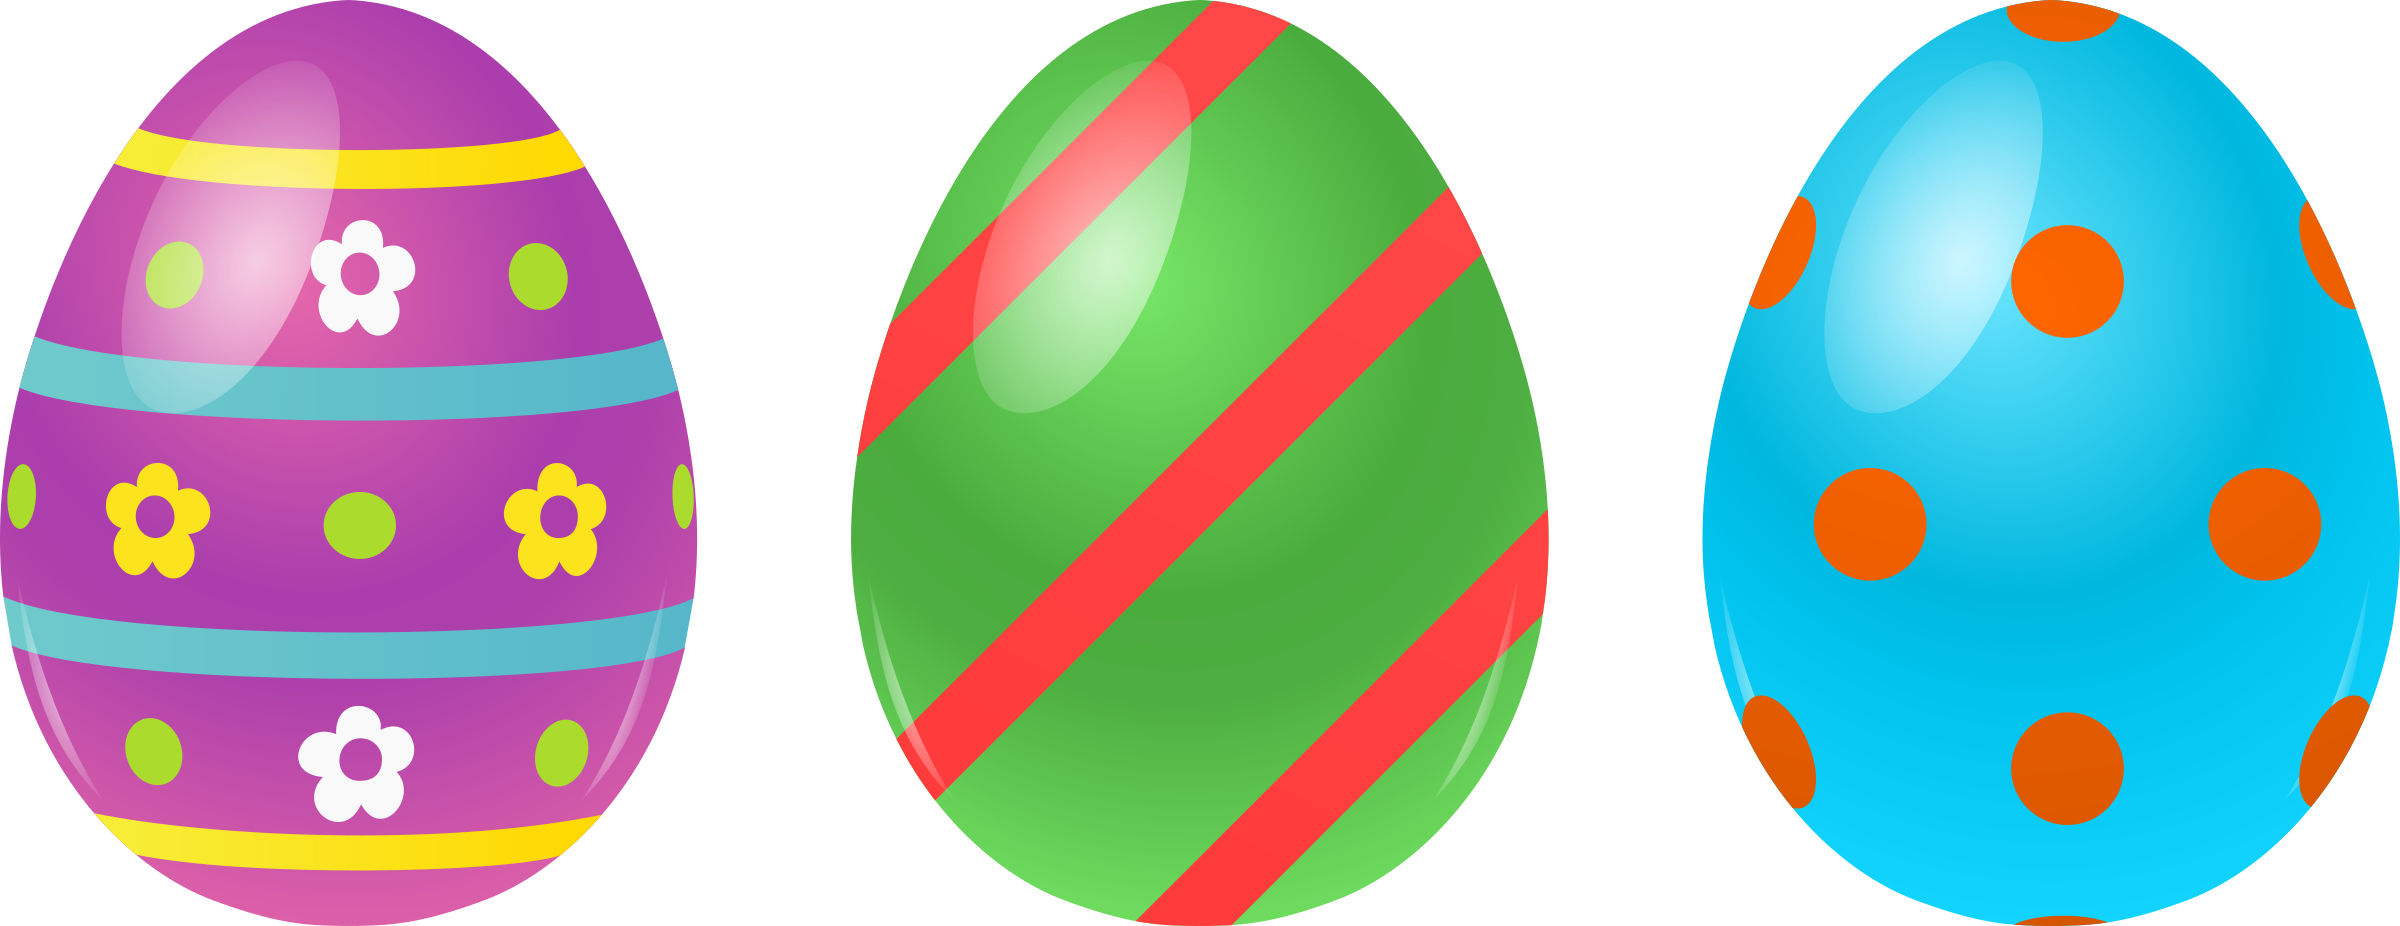 Colors clipart easter. Eggs free clip art